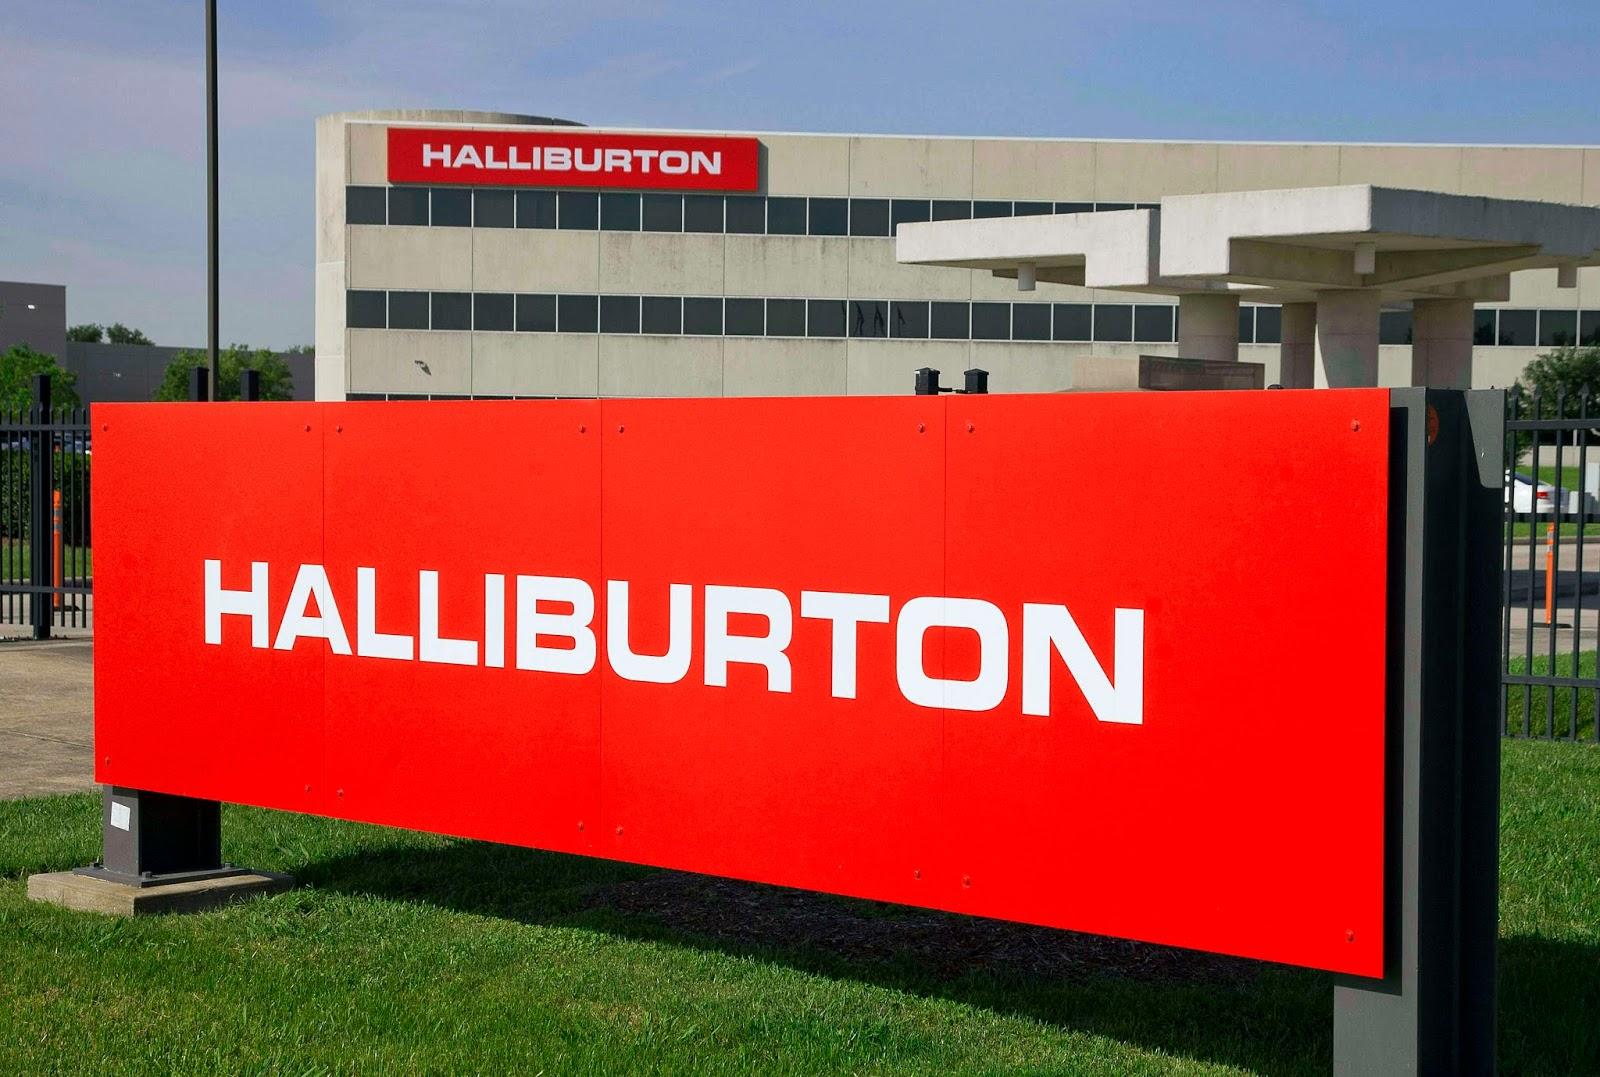 Us Caldwell Operator Assistant Ii Cementing: وظايف جديدة في شركه هاليبرتون للبترول Halliburton